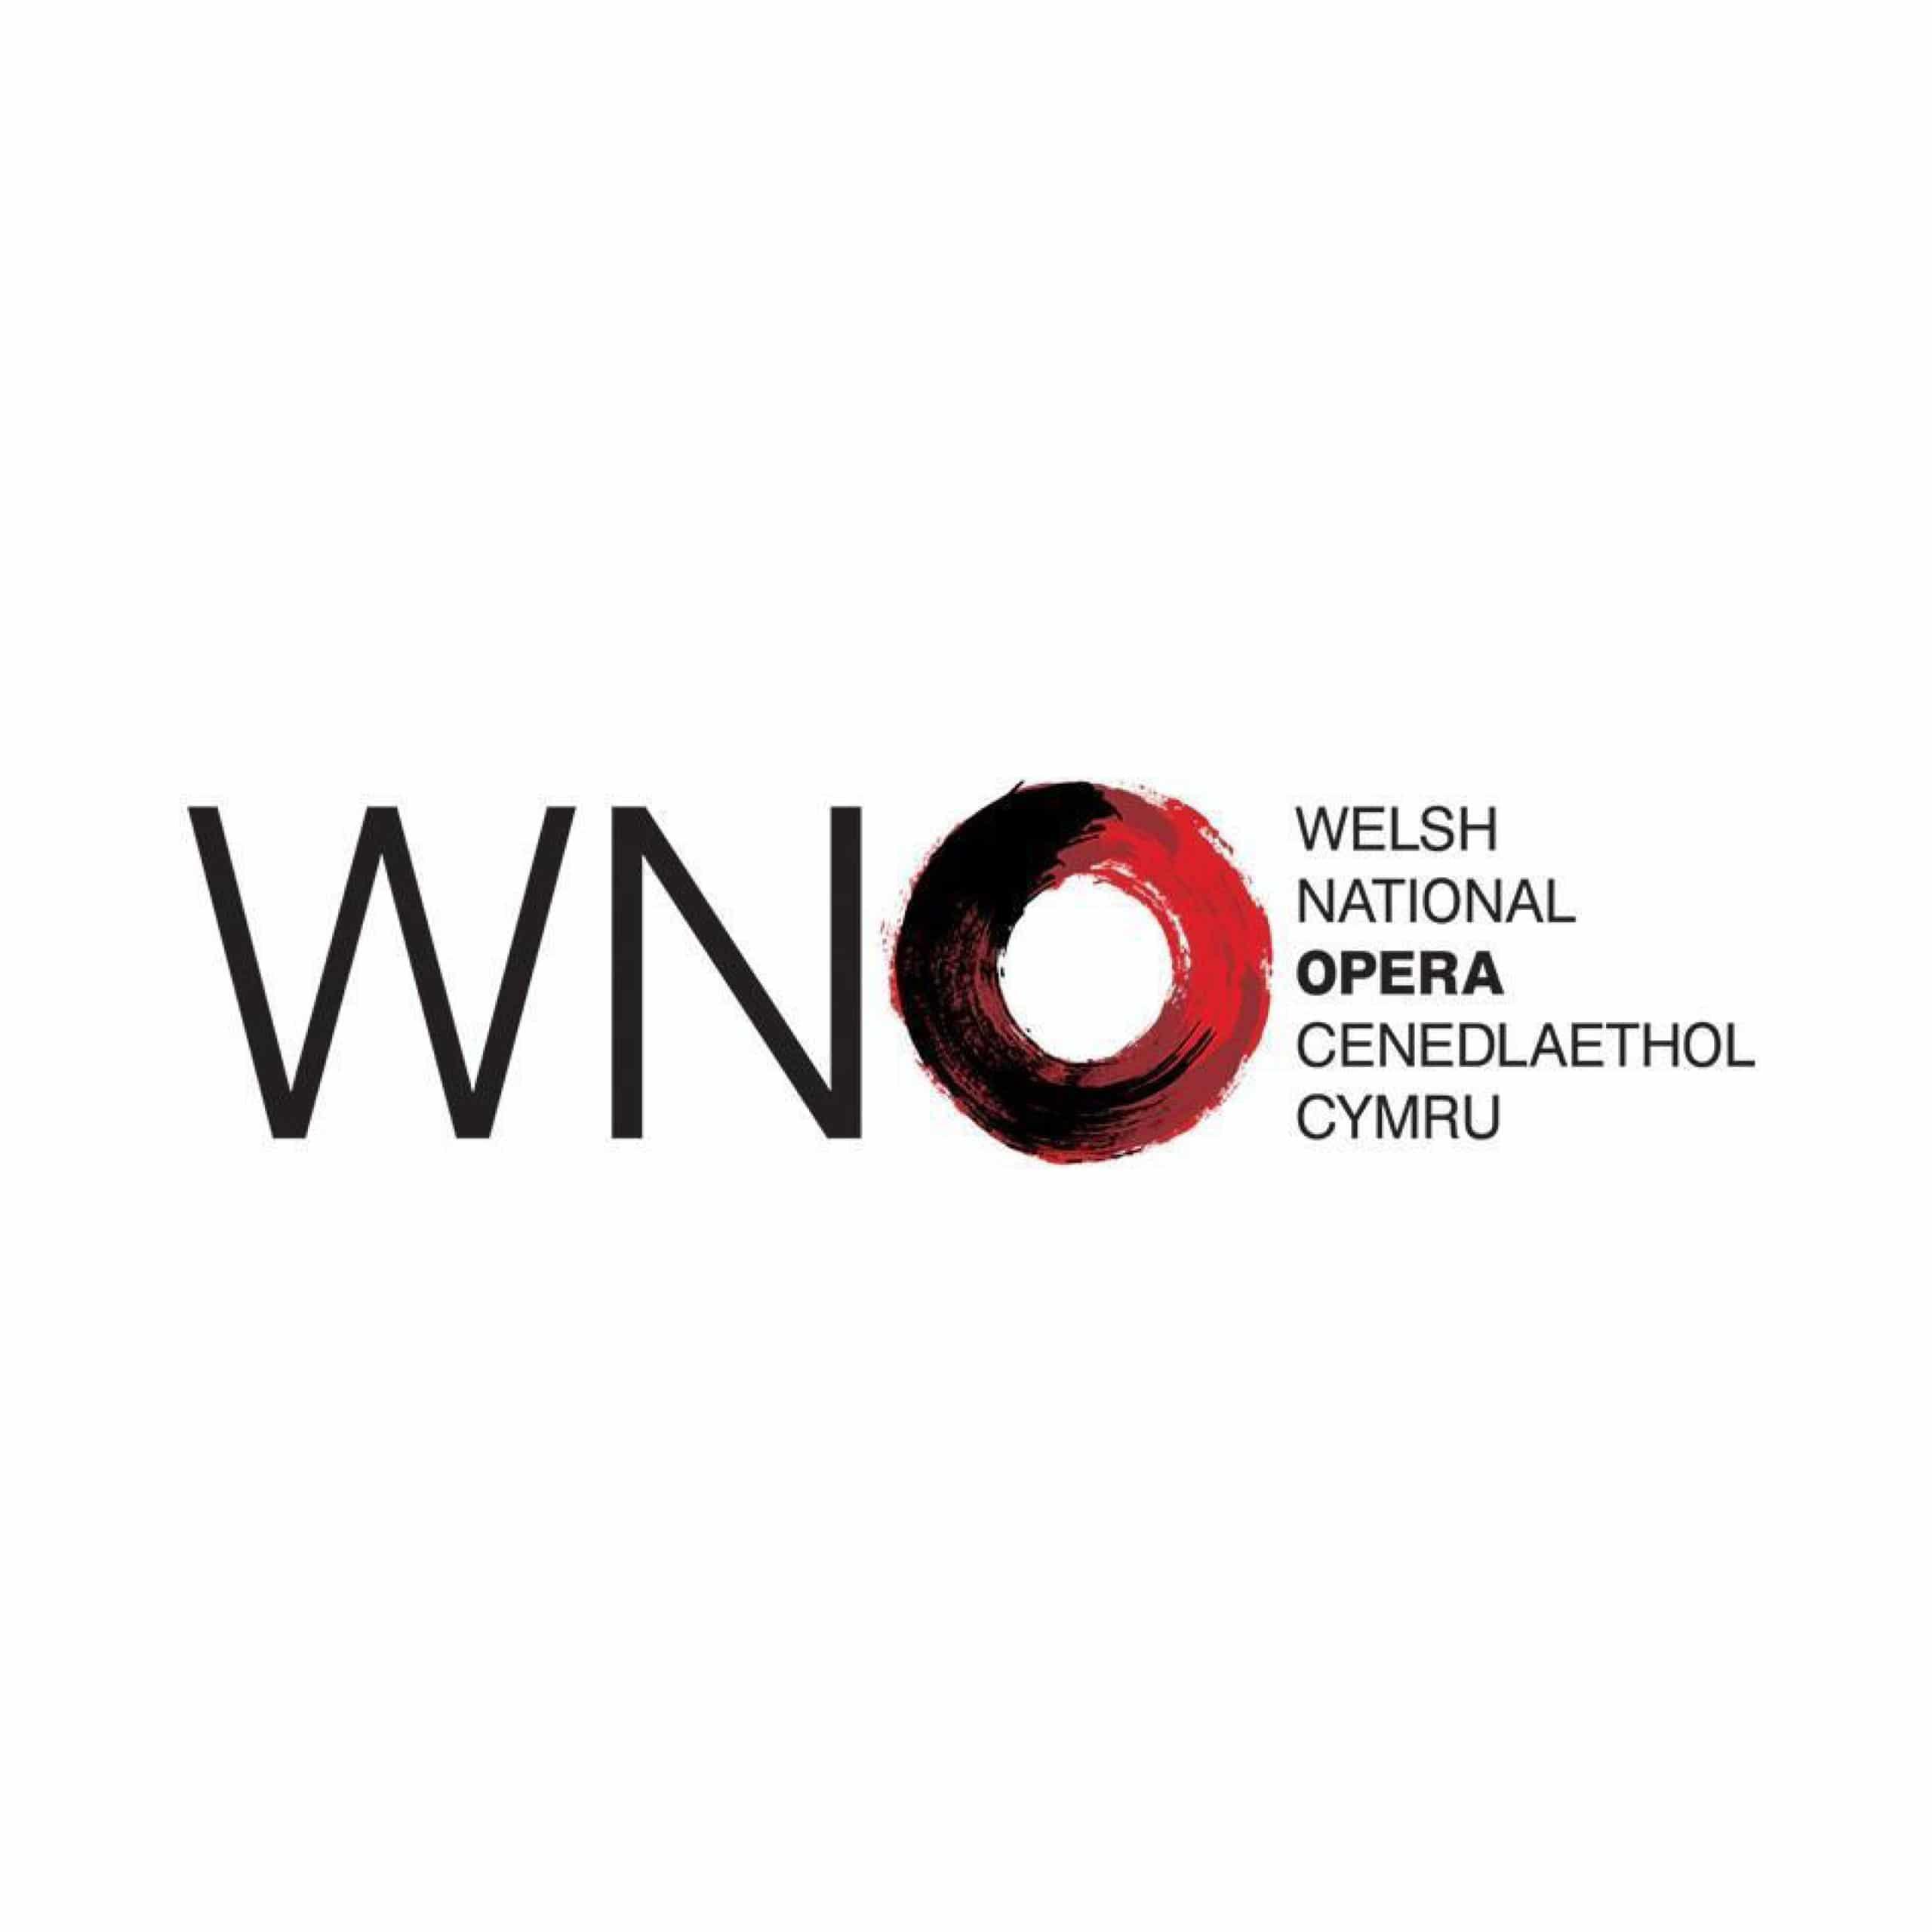 Fineline Print and Web | North Wales | Portfolio | Welsh National Opera (WNO)